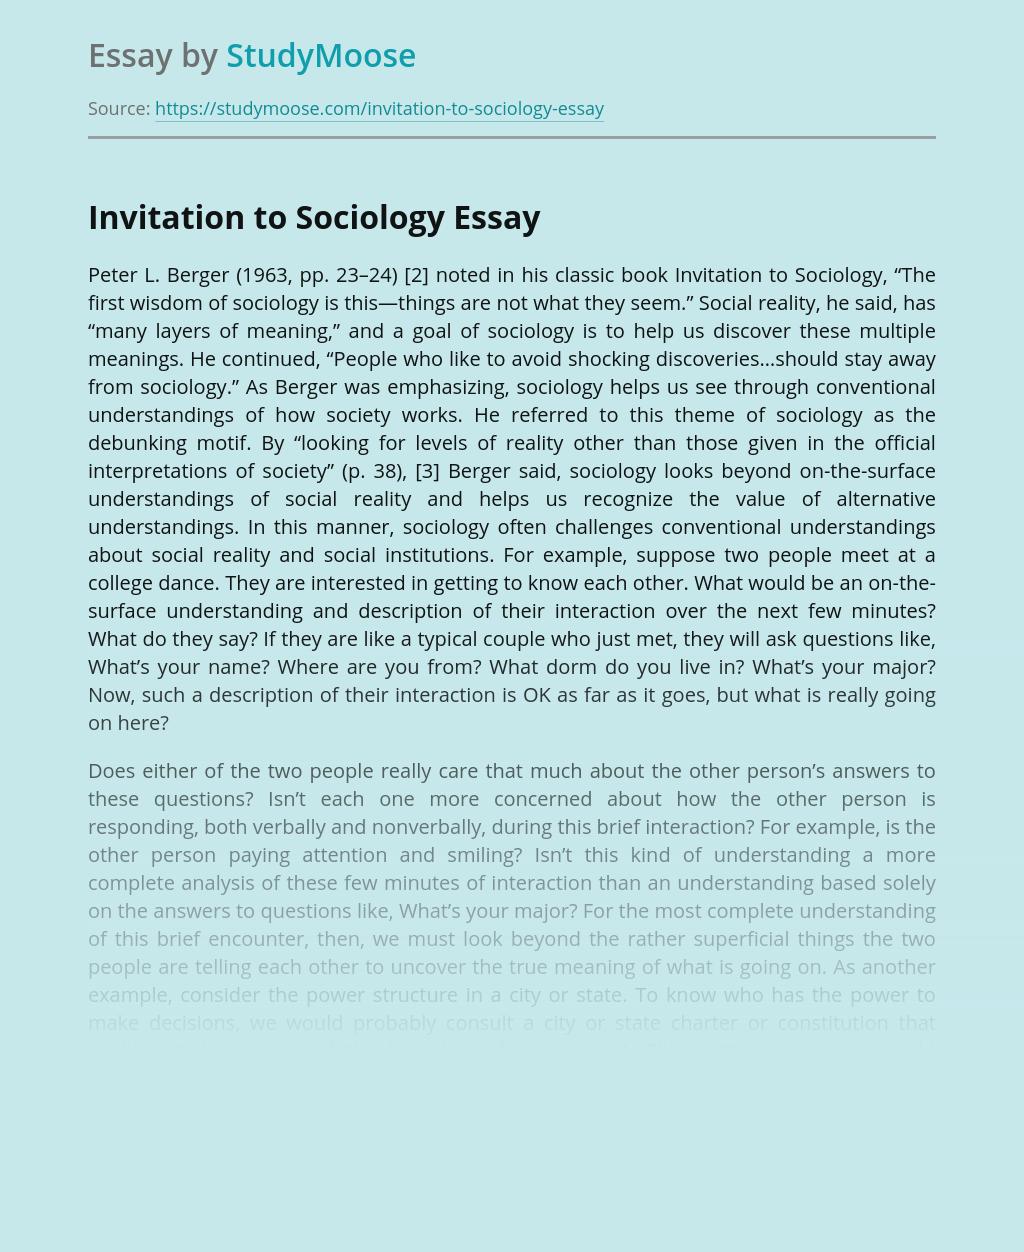 Invitation to Sociology